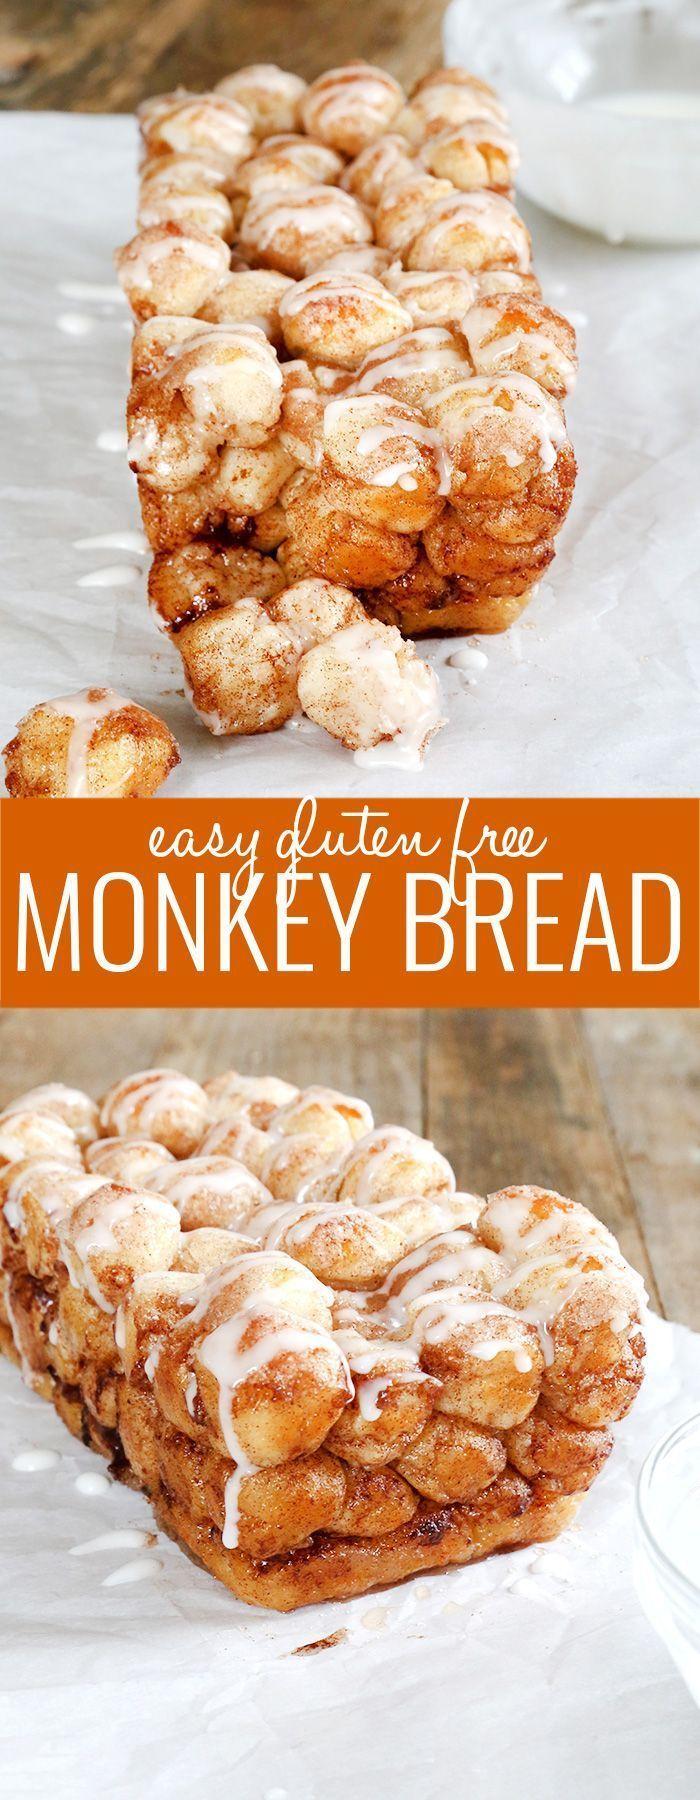 Super Easy Gluten Free Monkey Bread | A Fun Snack and Activity